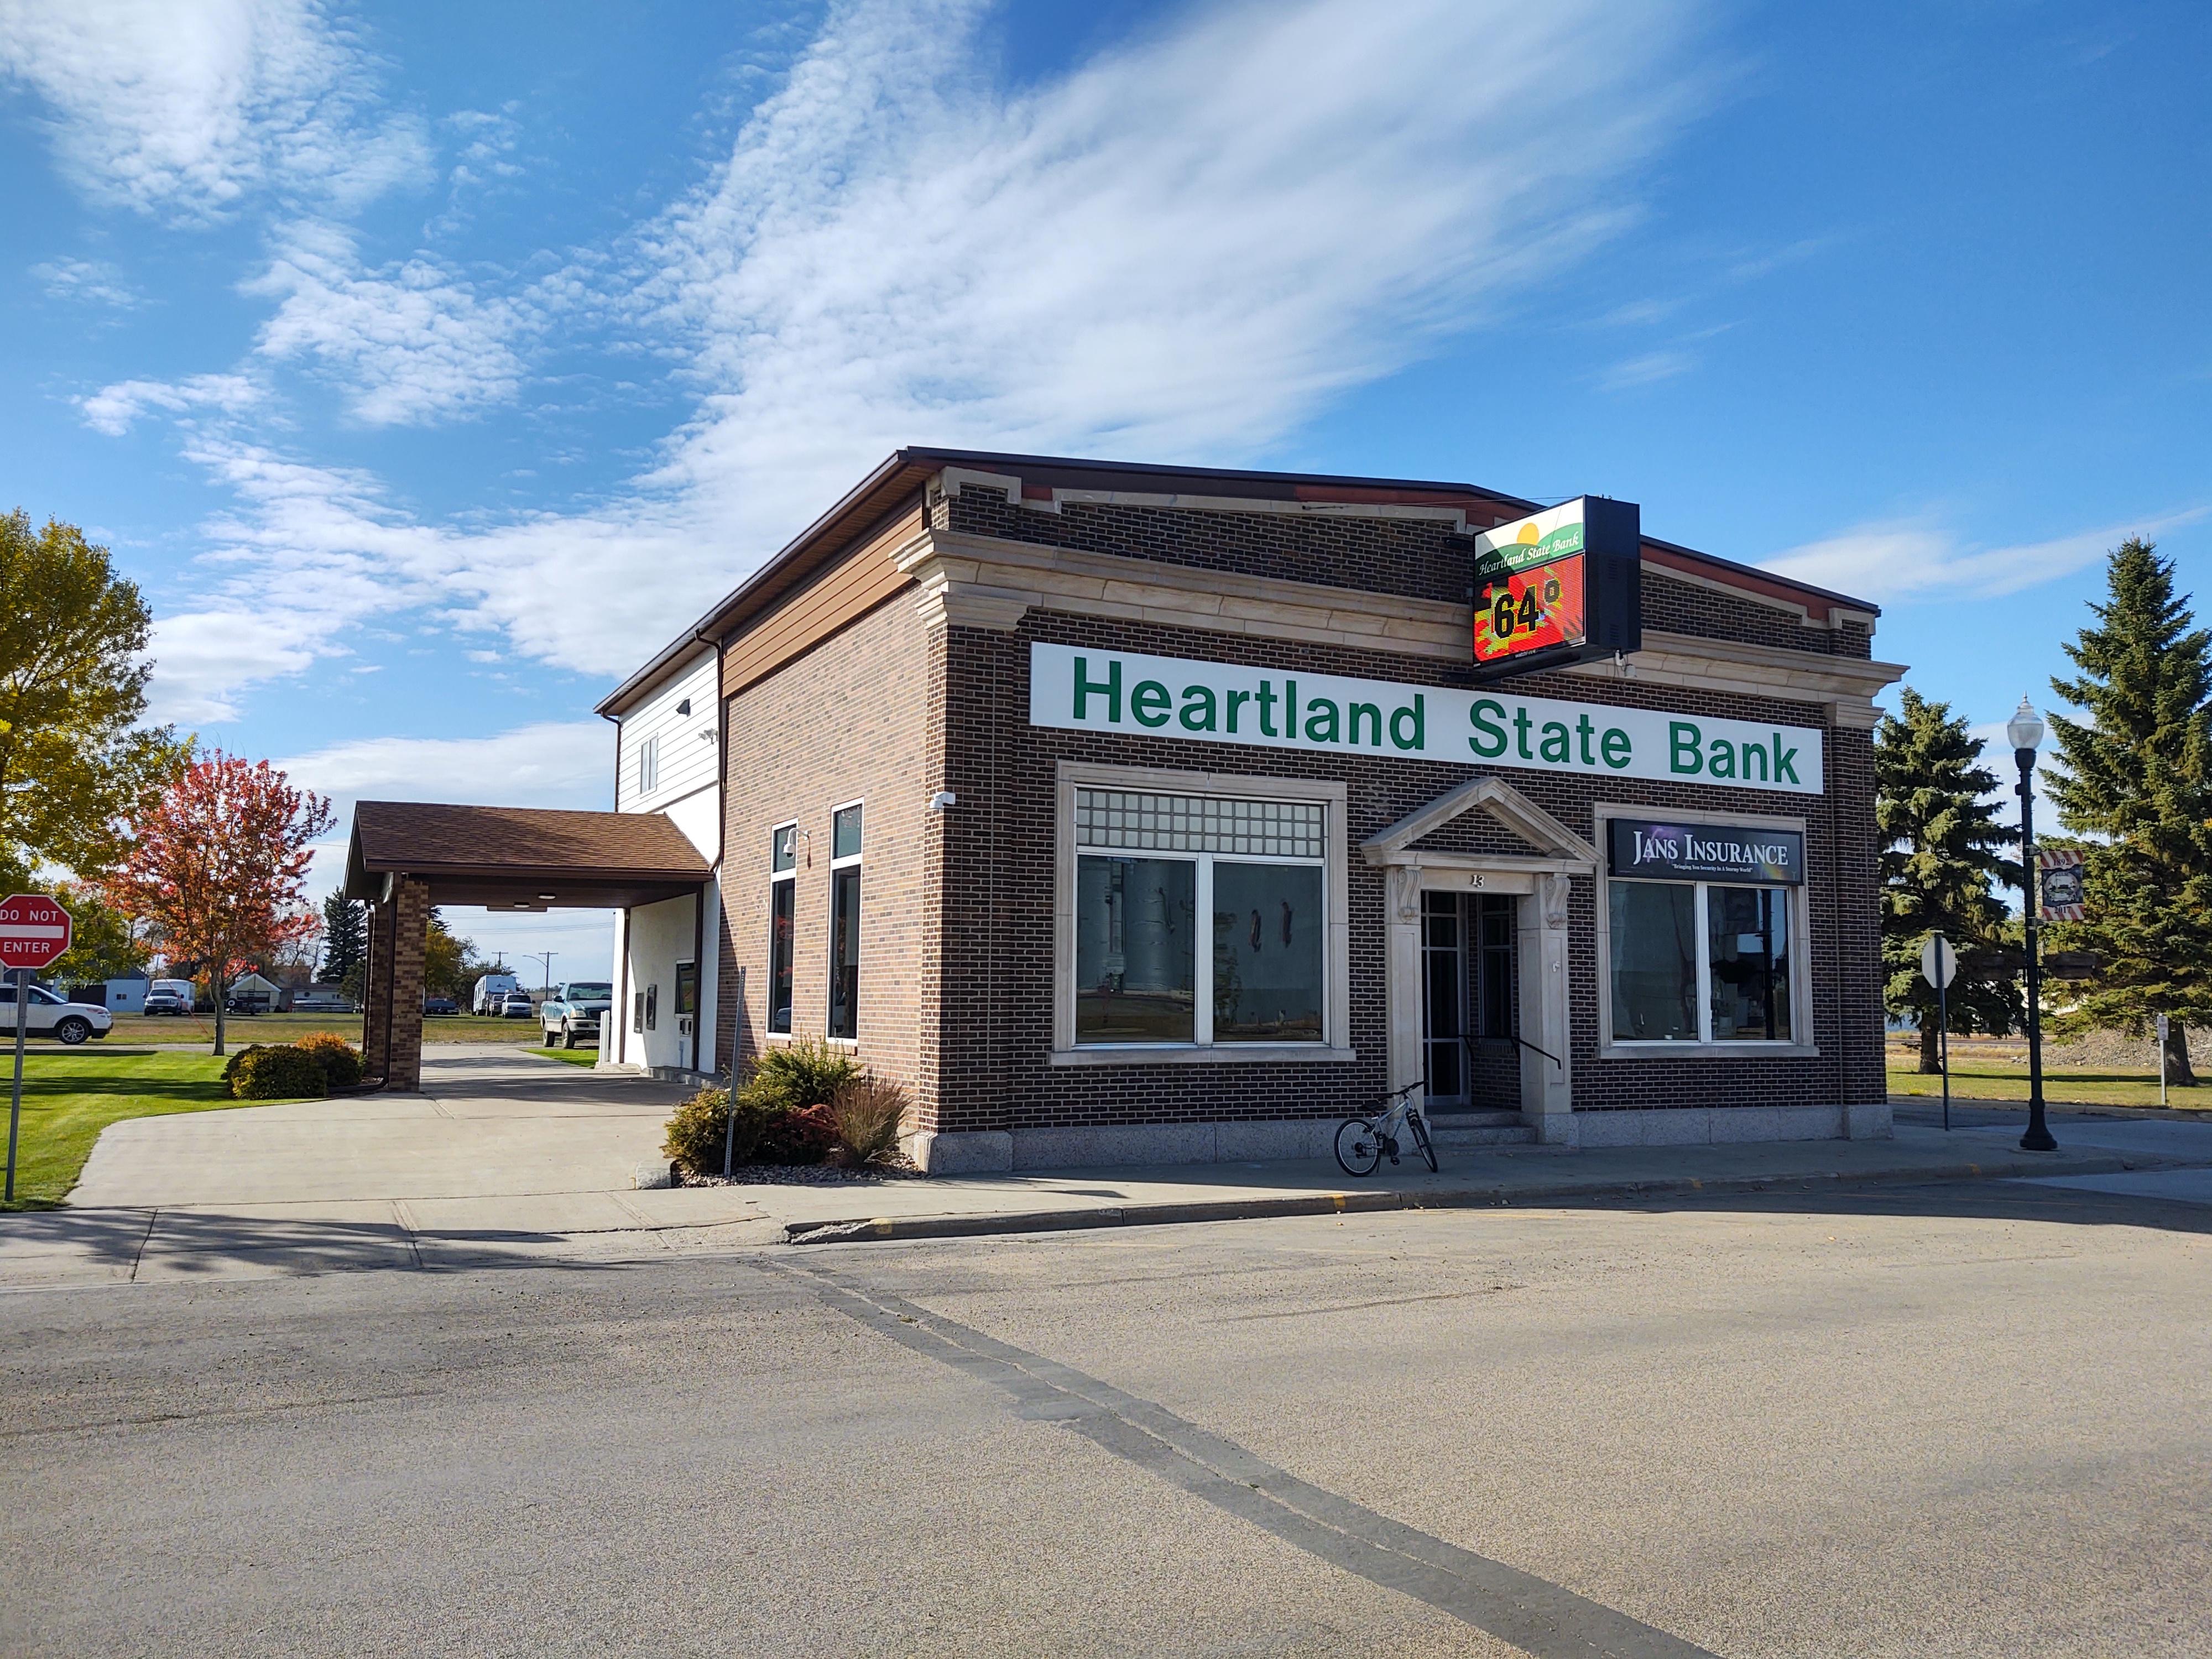 Heartland State Bank, Exterior